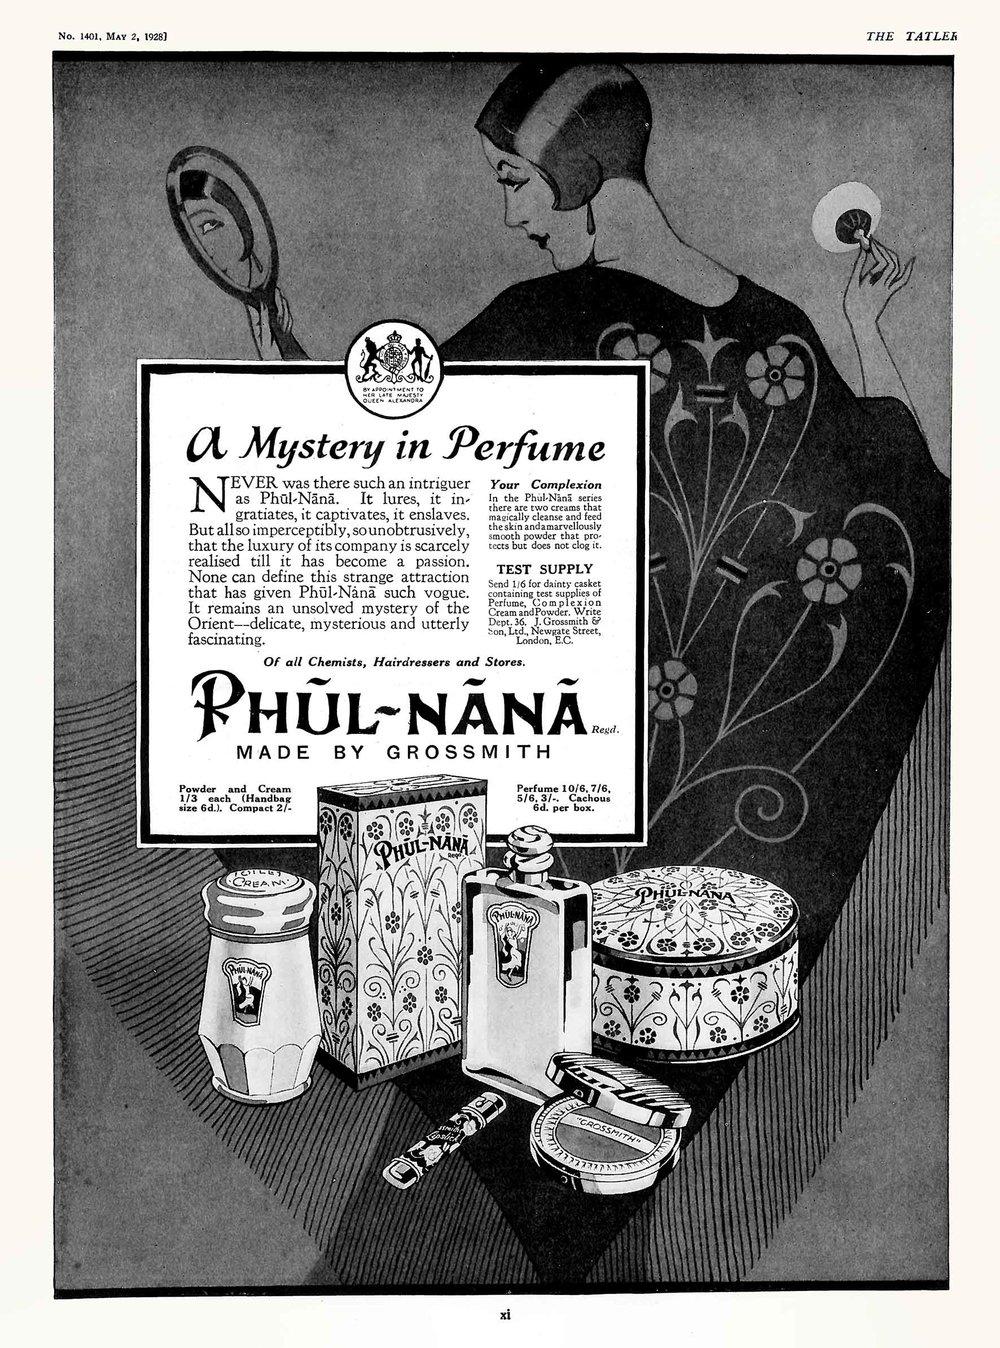 Grossmith - Phul-Nana Advert - The Tatler - 2 May 1928.jpg